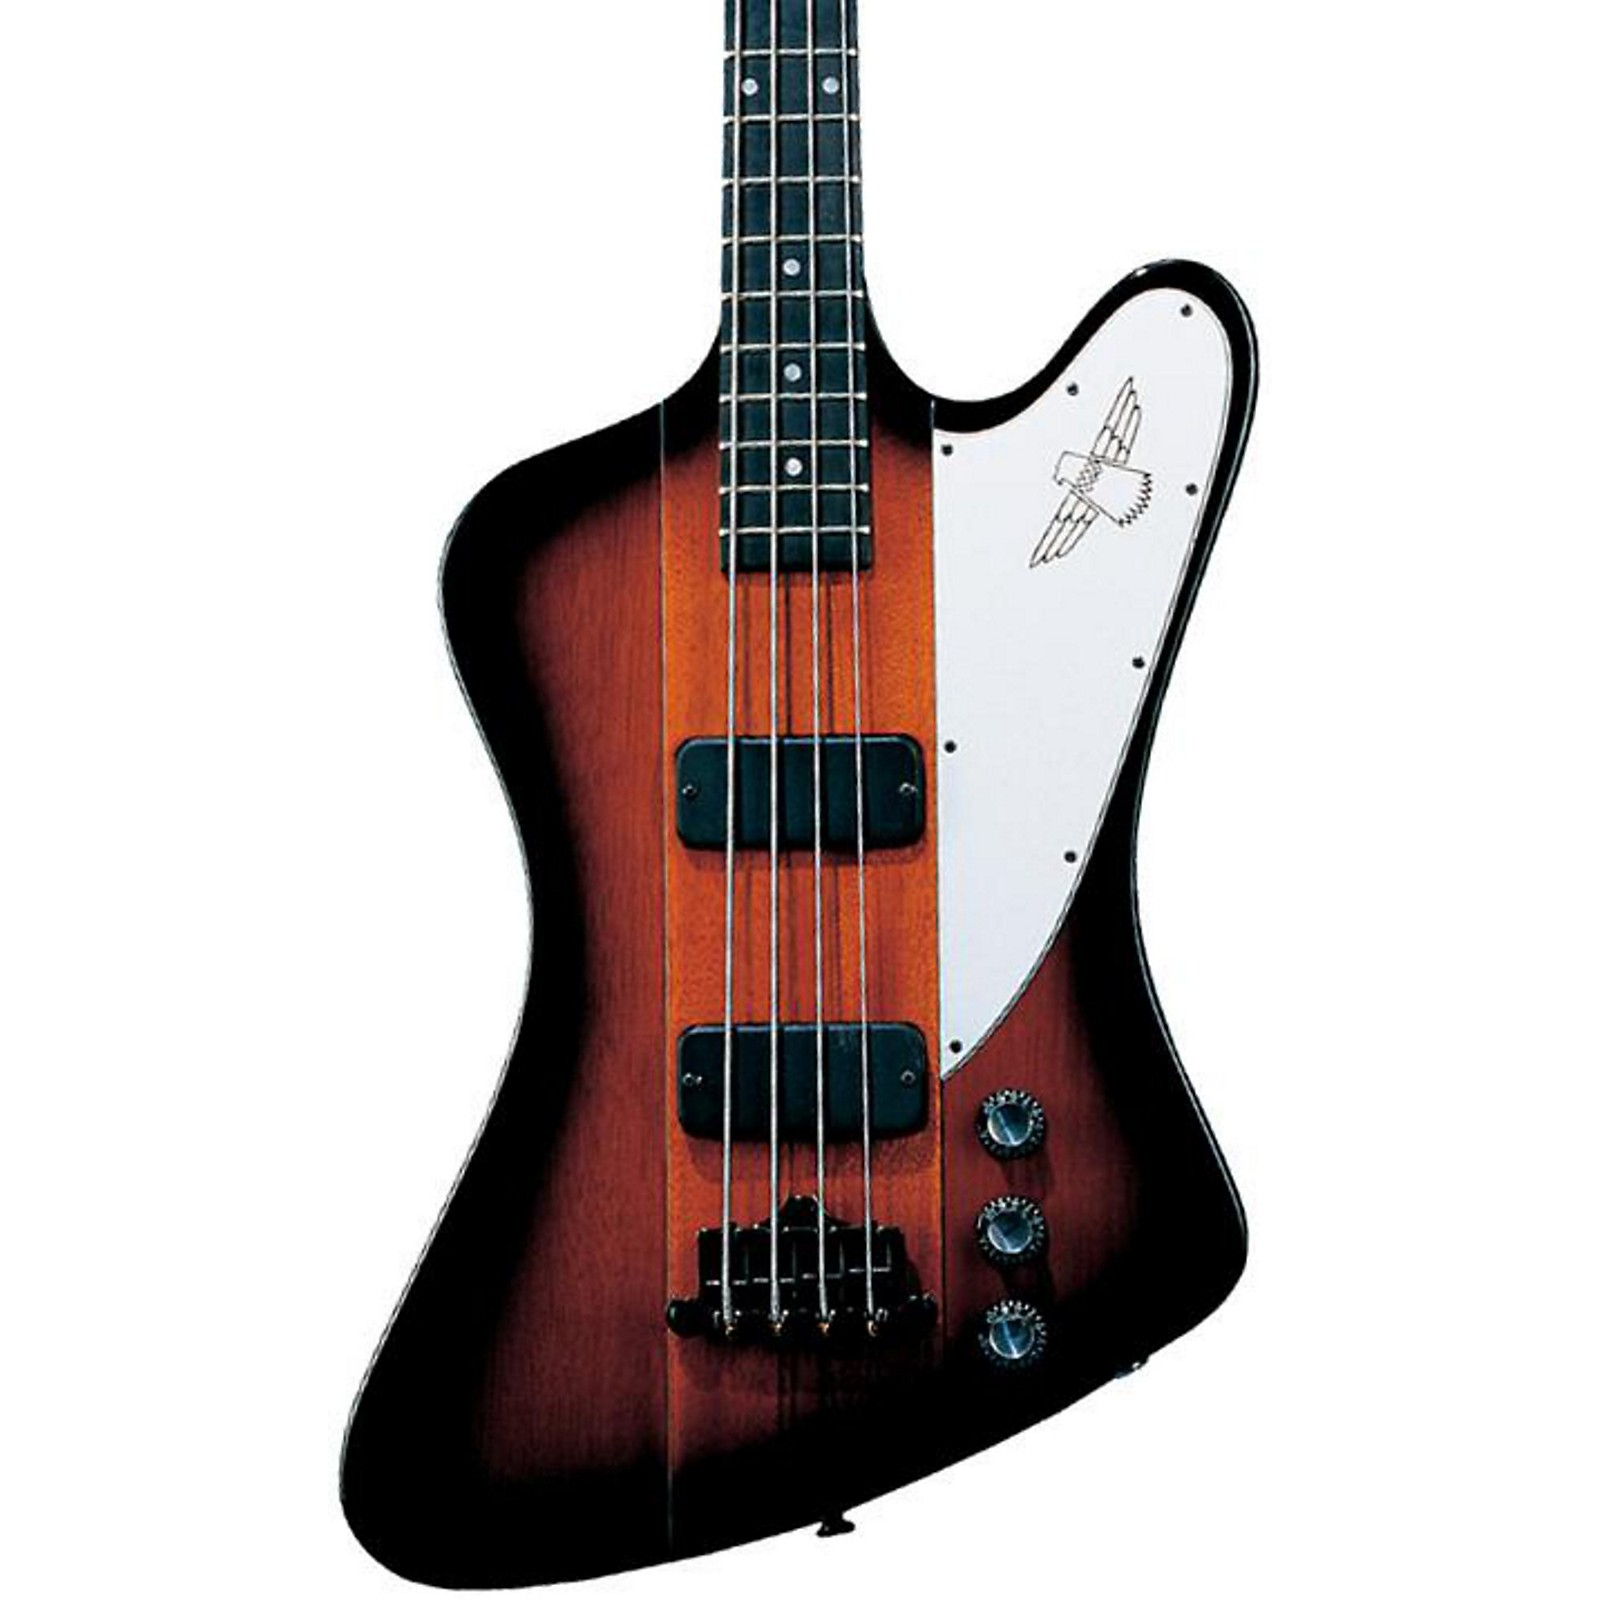 Epiphone Thunderbird Classic-IV PRO Electric Bass Guitar